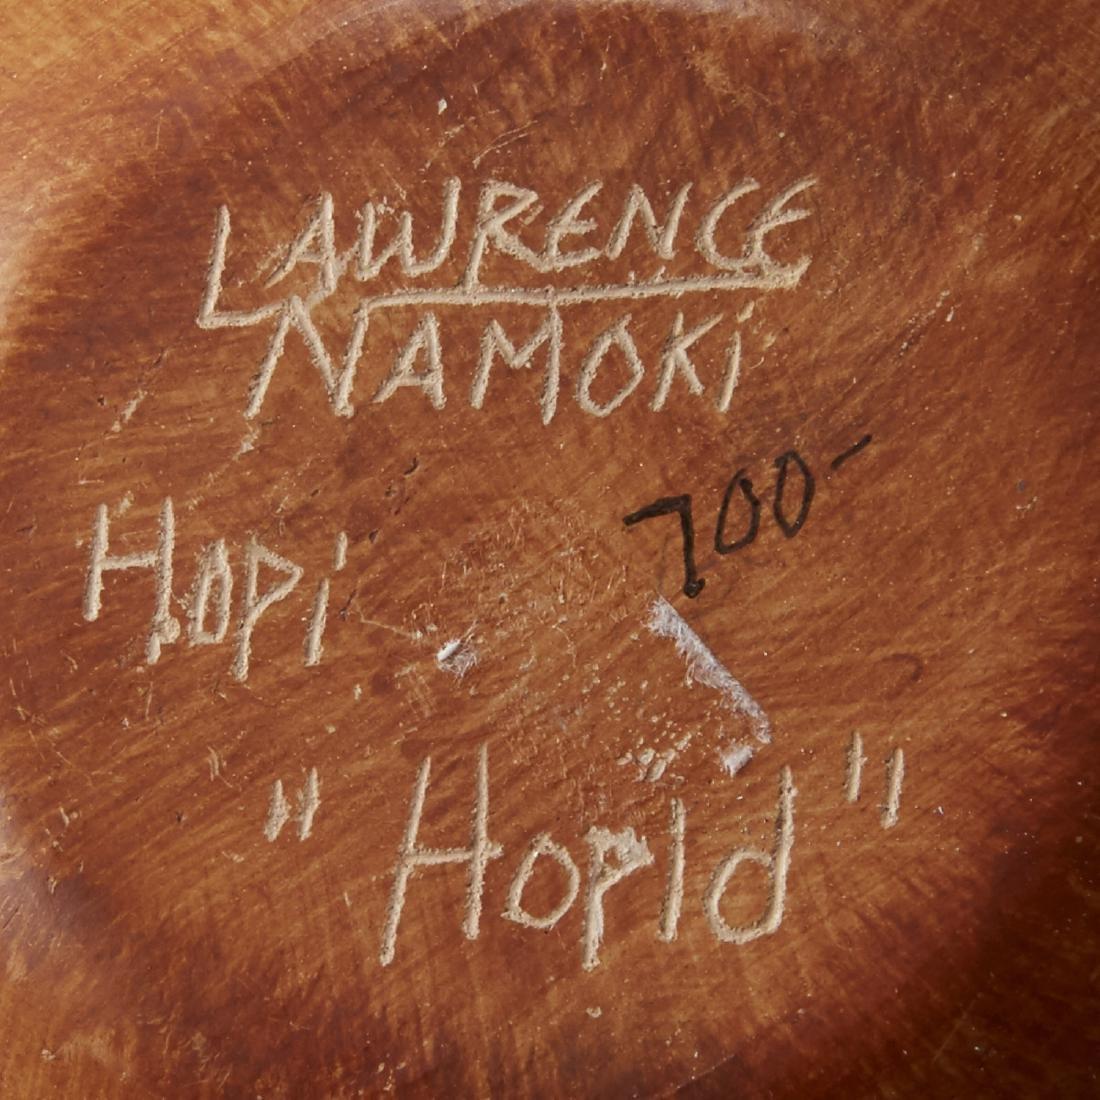 Group of 4 Lawrence Namoki Hopi Carved Jars - 5